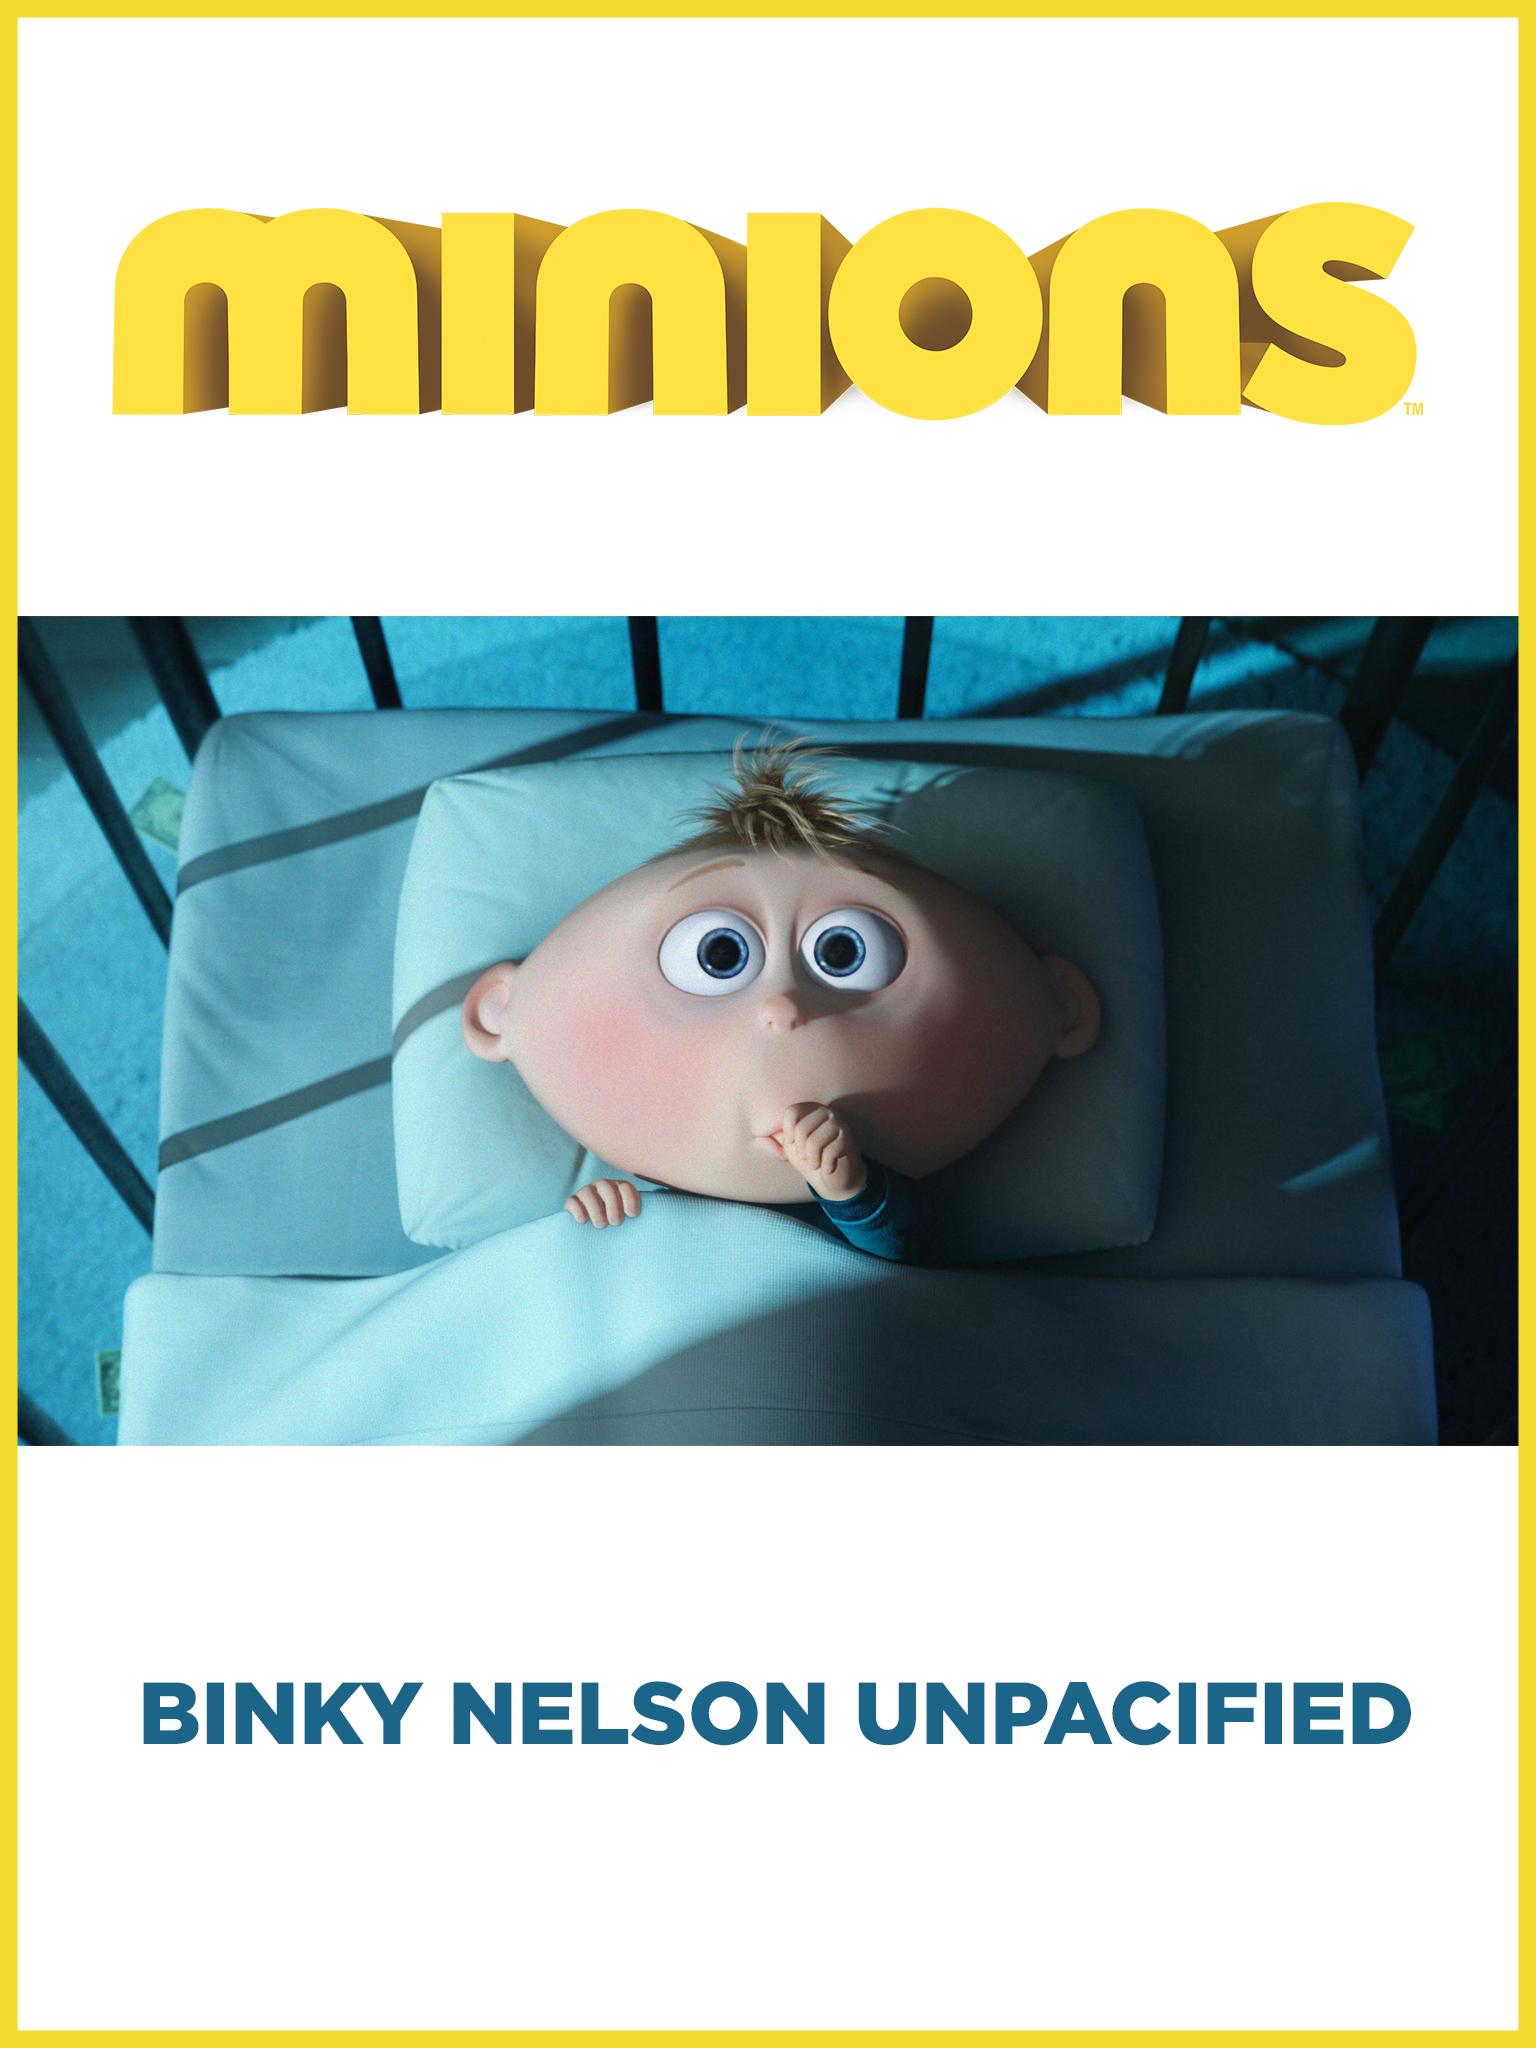 Minions: Binky Nelson Unpacified